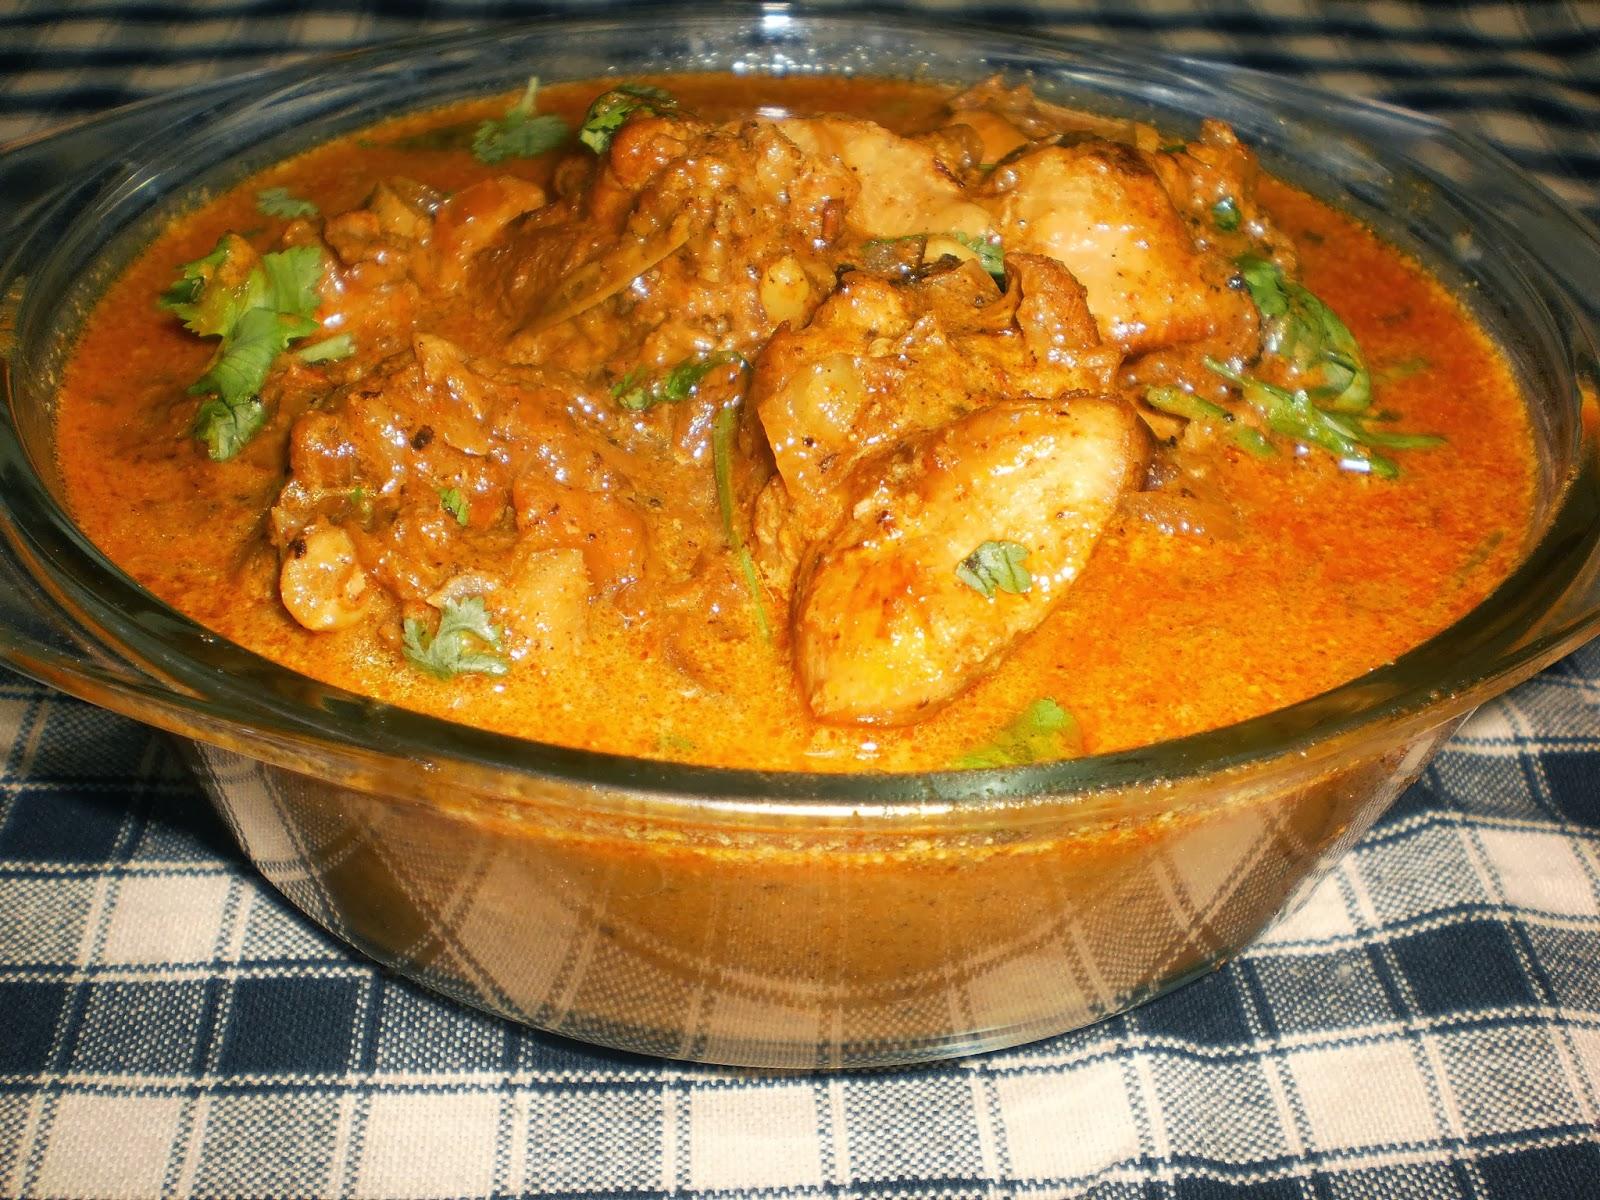 Sojo's Masala: Fried Chicken in Gravy/ North Indian ...